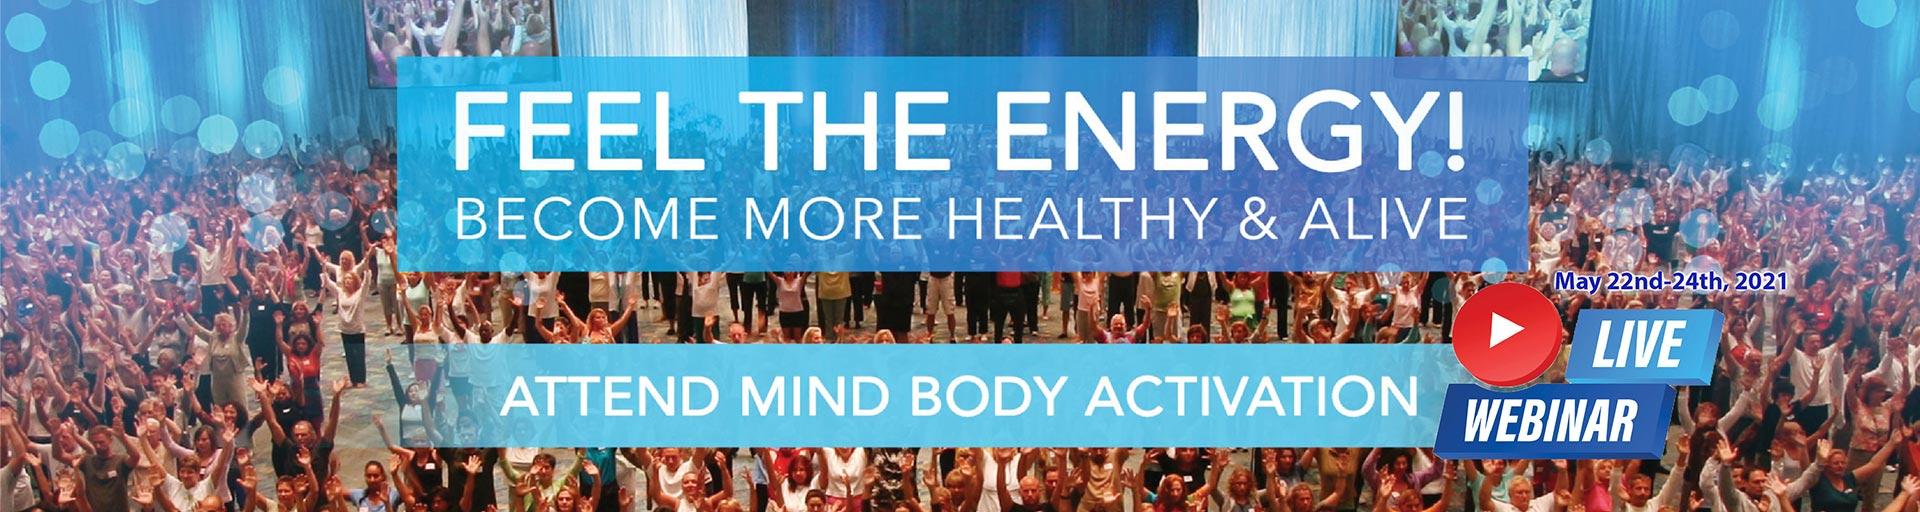 qigong mindy body activation live webinar